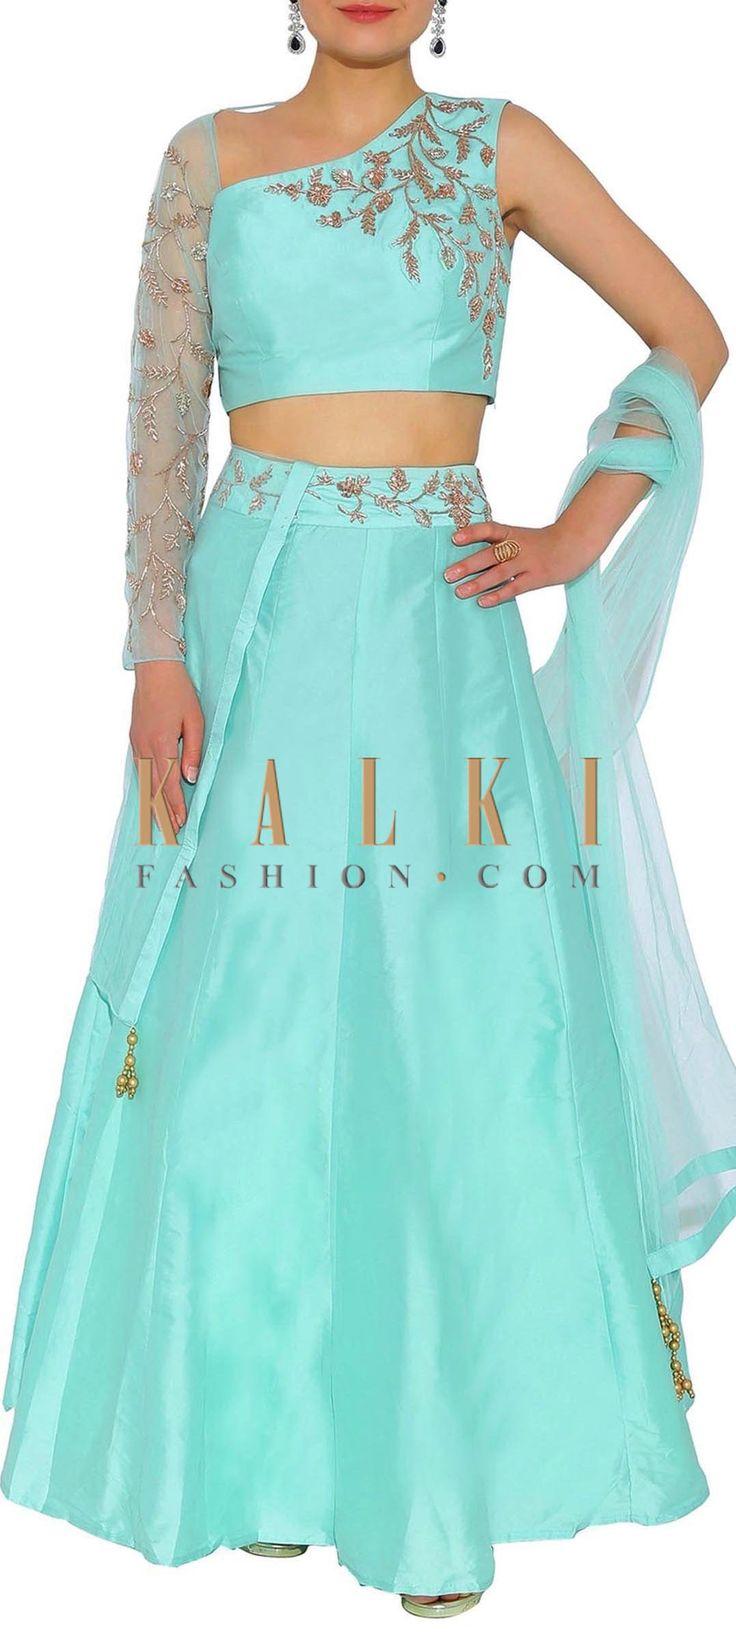 Kalki Sea Blue One Sleeves Silk And Net Lehenga Choli With Zardosi Embroidery